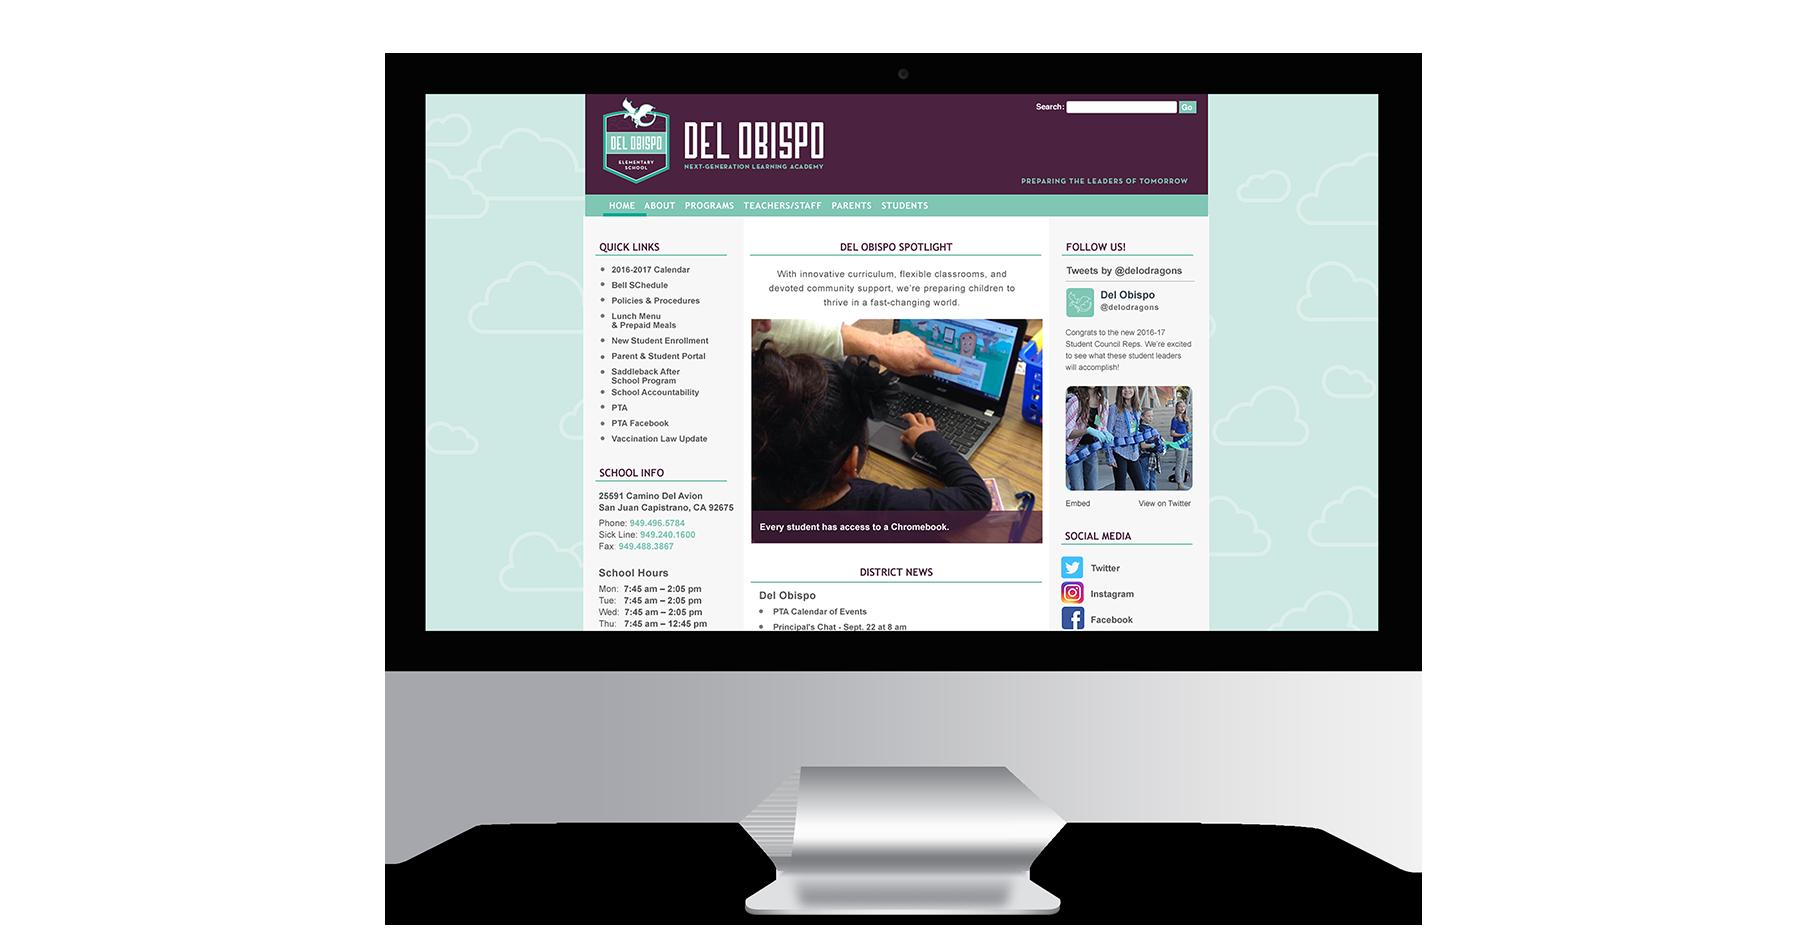 del obispo elementary school website design